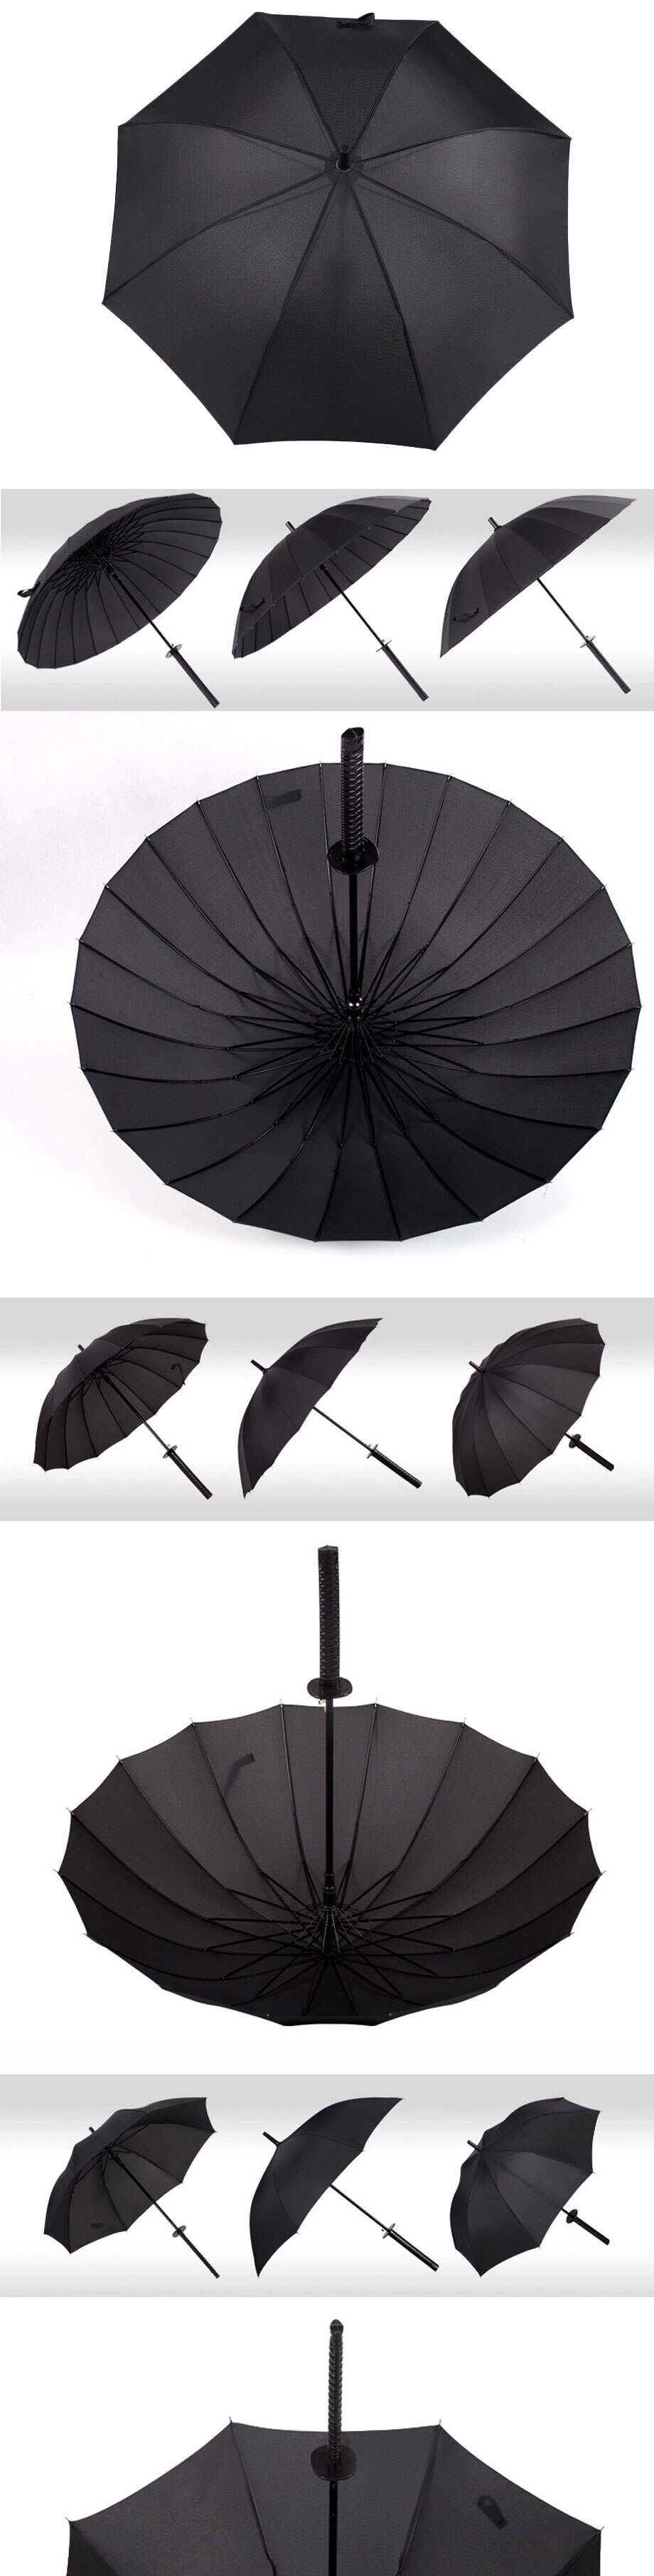 Creative Long Handle Large Windproof Samurai Sword Umbrella Japanese Ninja-like Sun Rain Straight Umbrellas Automatic Open